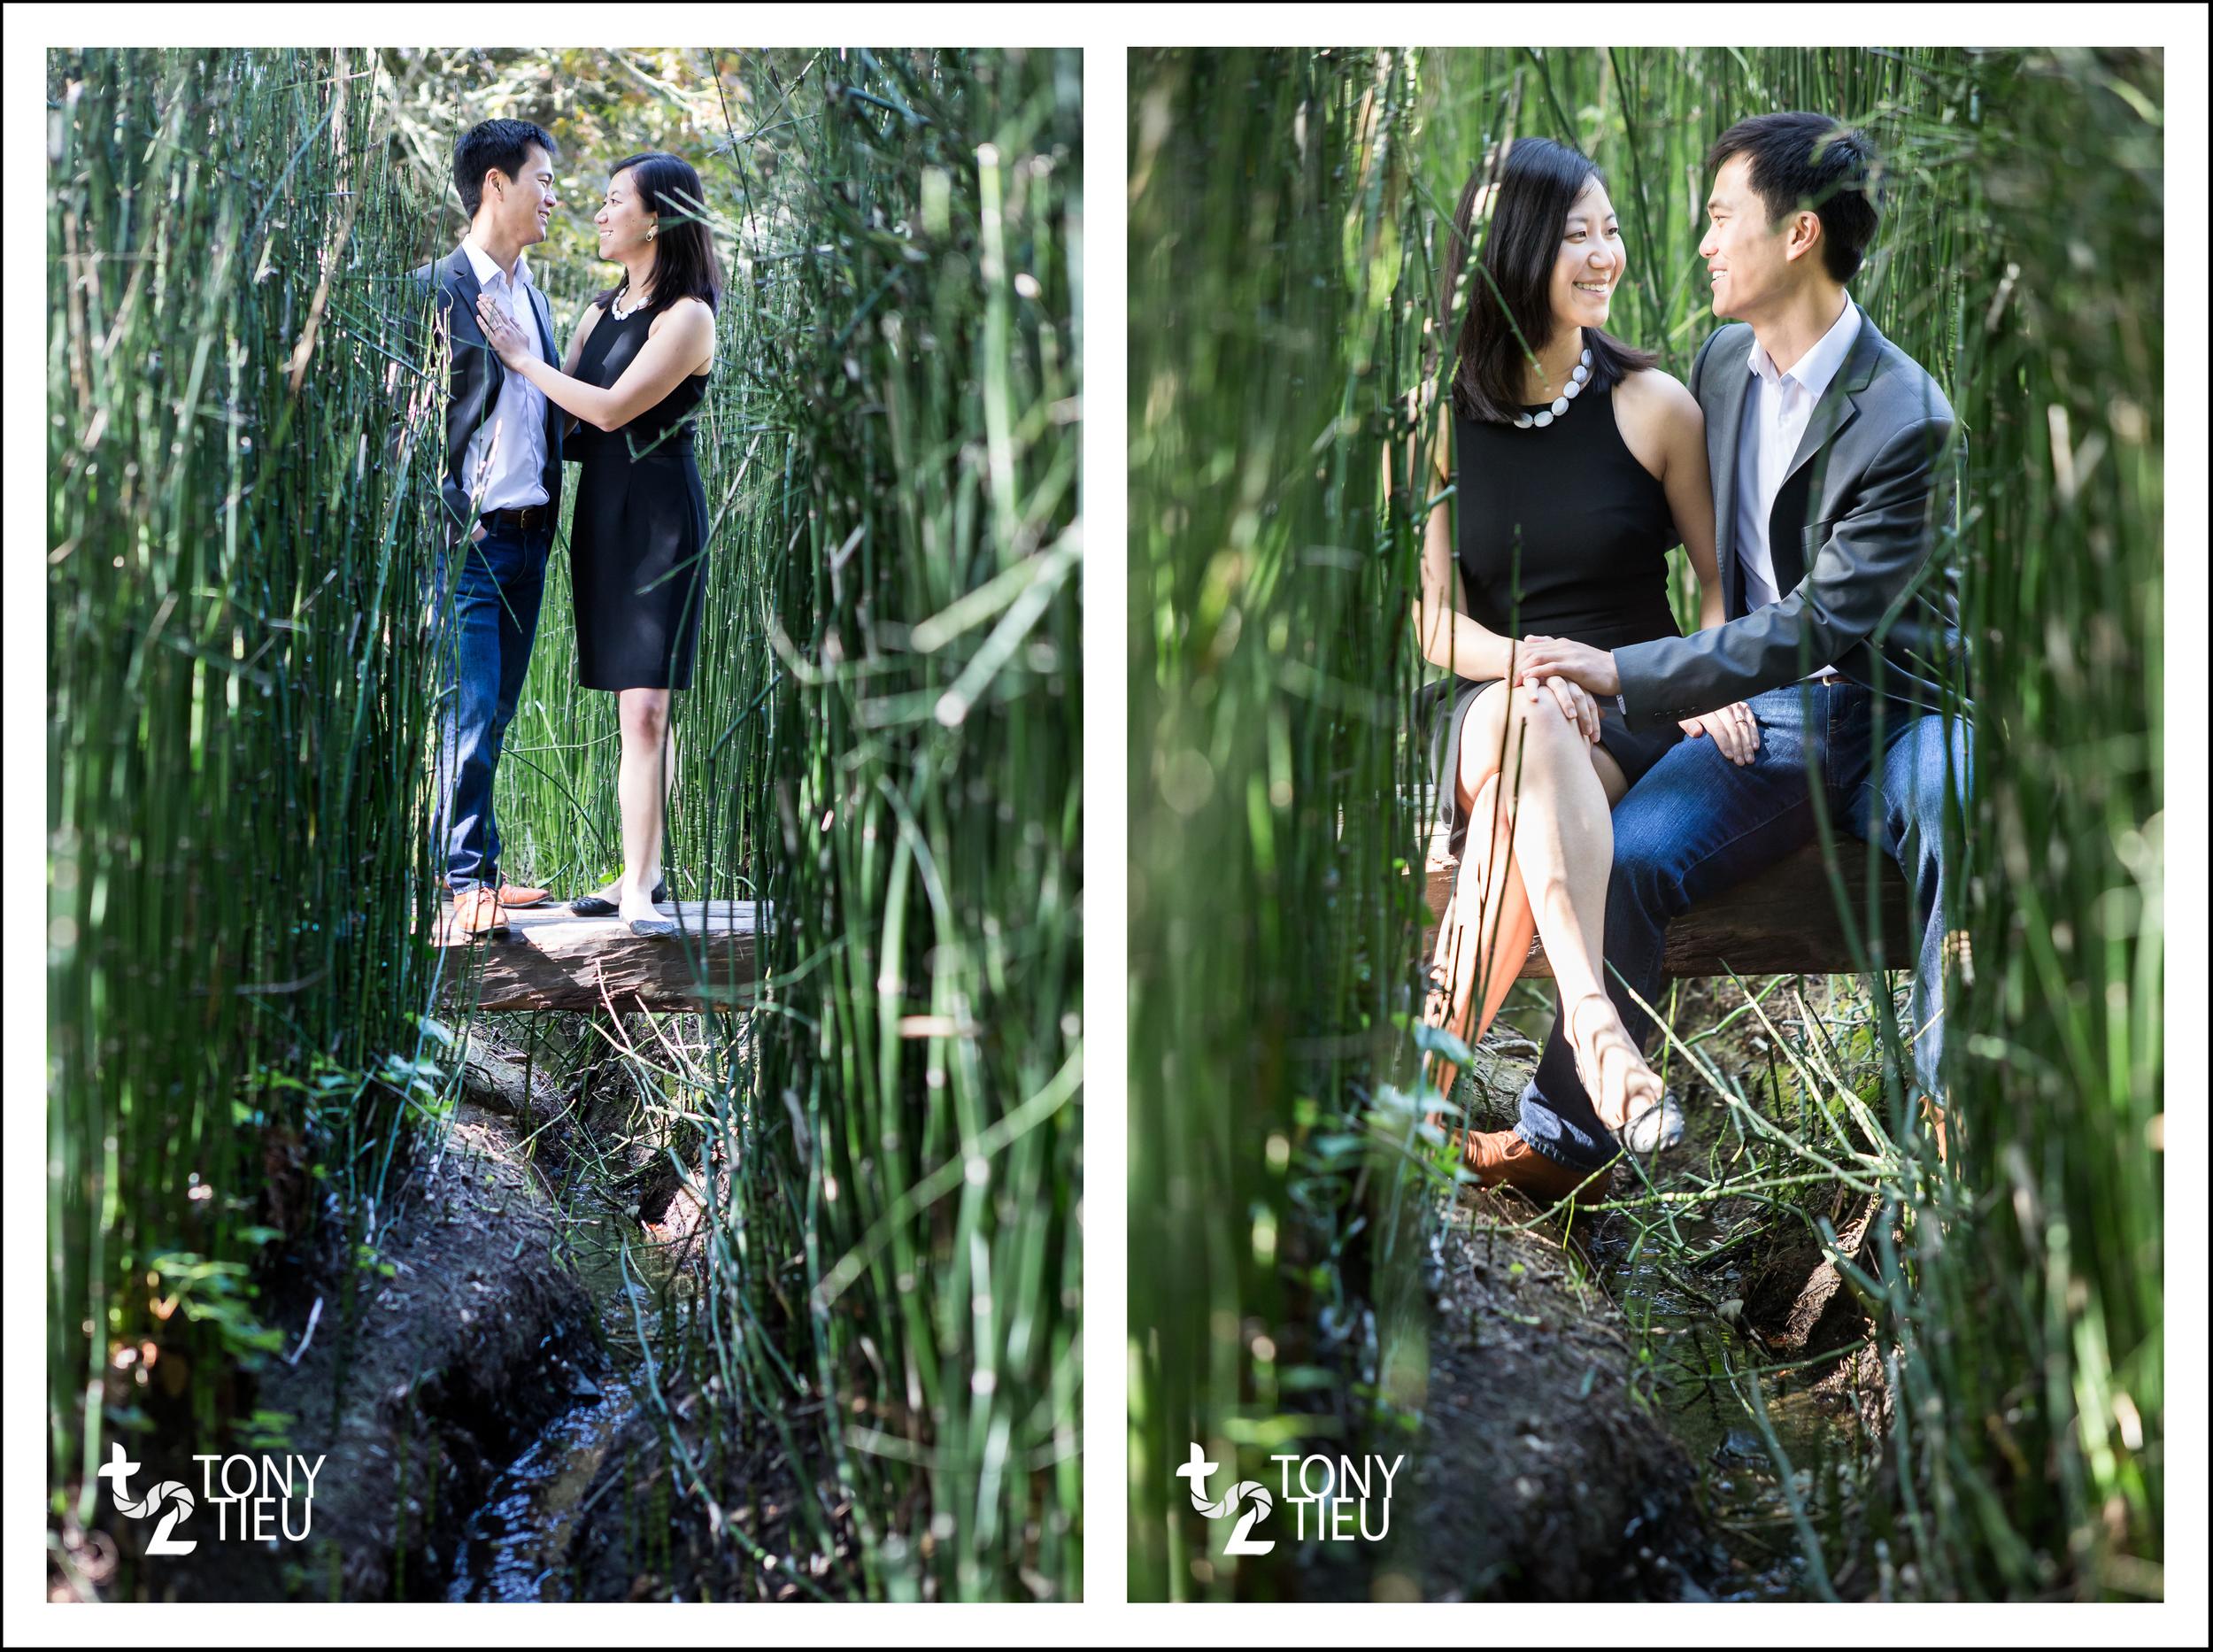 Tony_Tieu_Yang Jimmy_Engagement_7